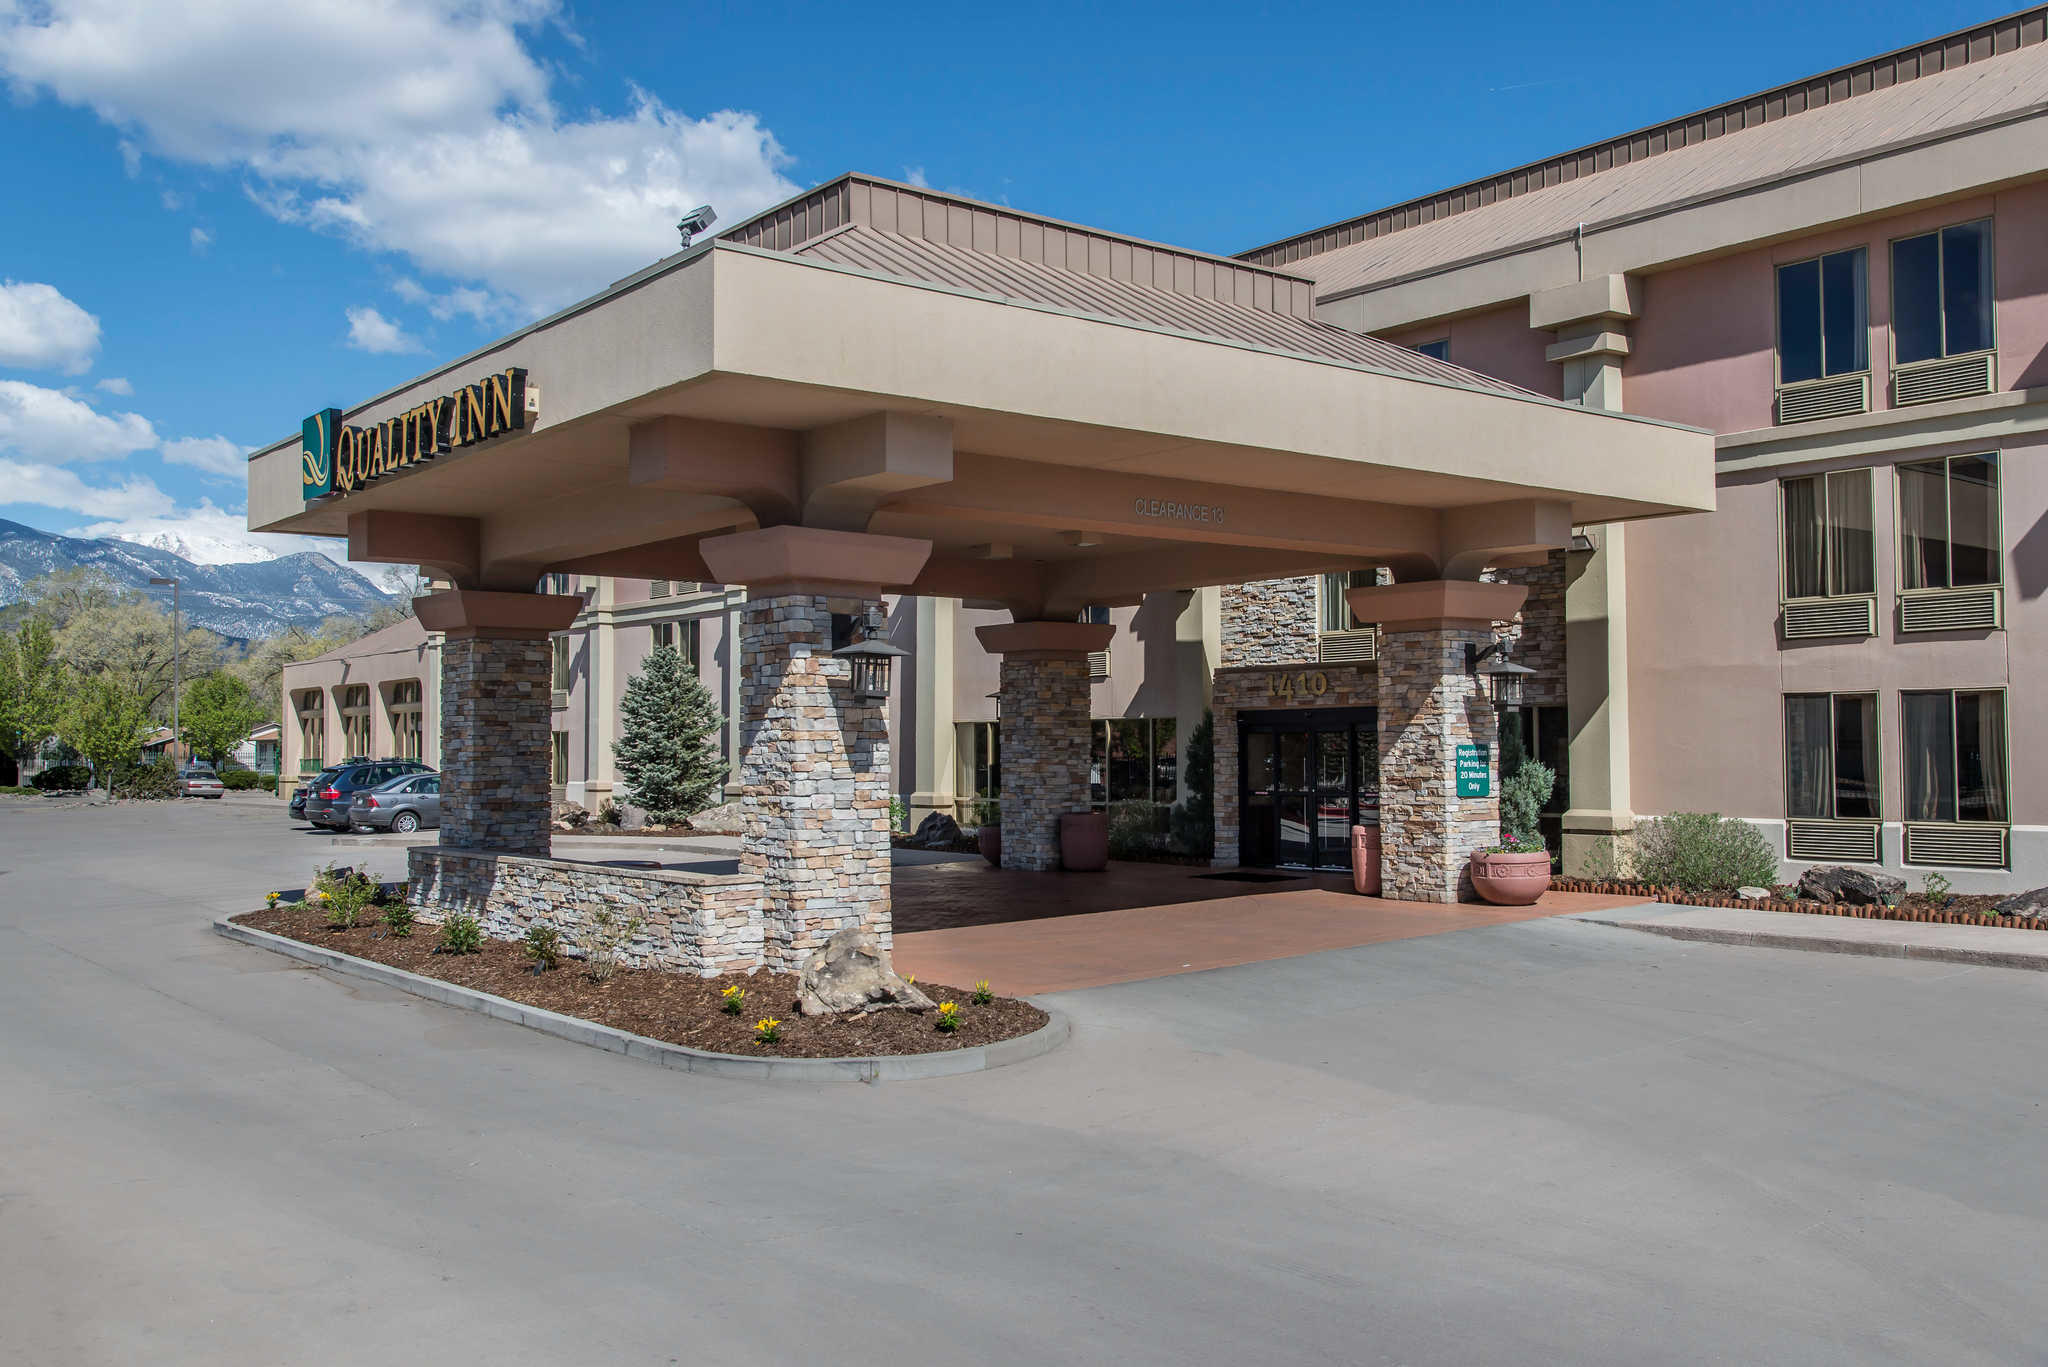 Quality Inn South In Colorado Springs Co 80906